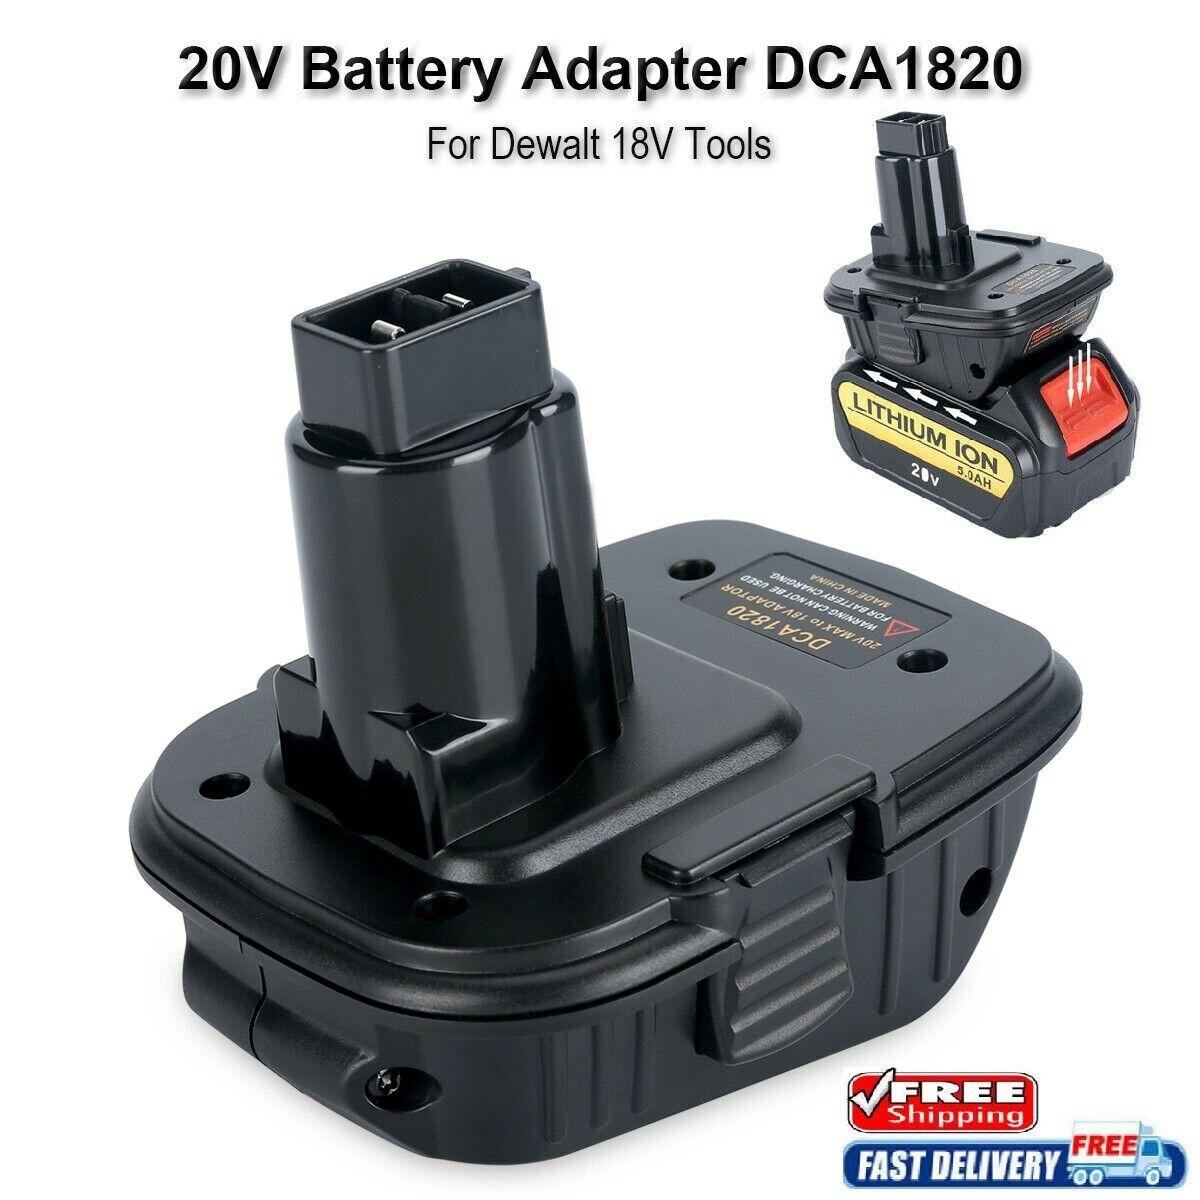 New DCA1820 Battery Adapter for Dewalt 18V Tools, to Convert